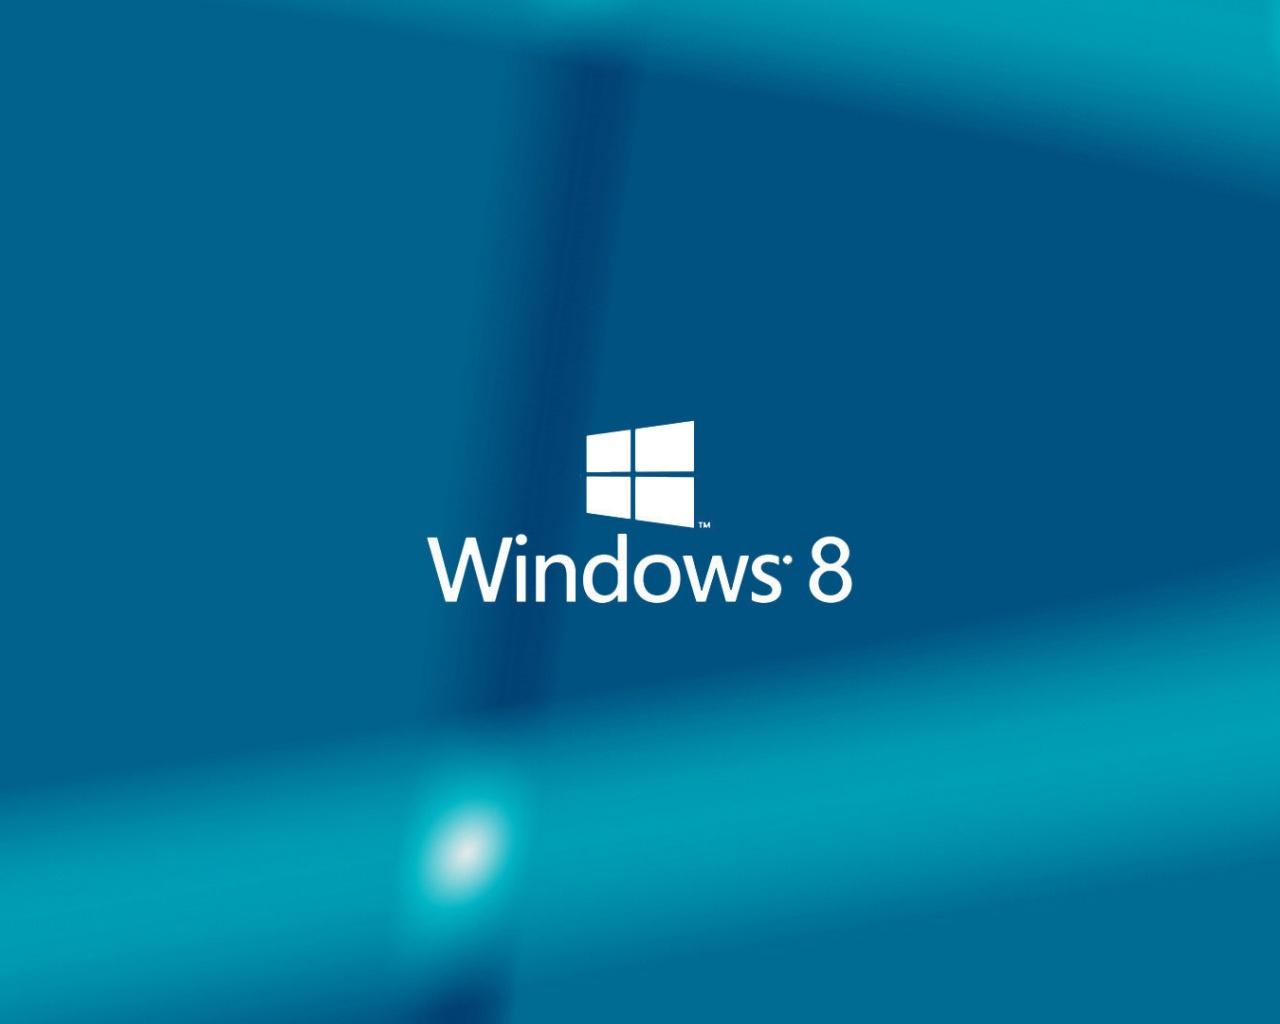 1280x1024 Windows 8 Blue Background desktop PC and Mac wallpaper 1280x1024